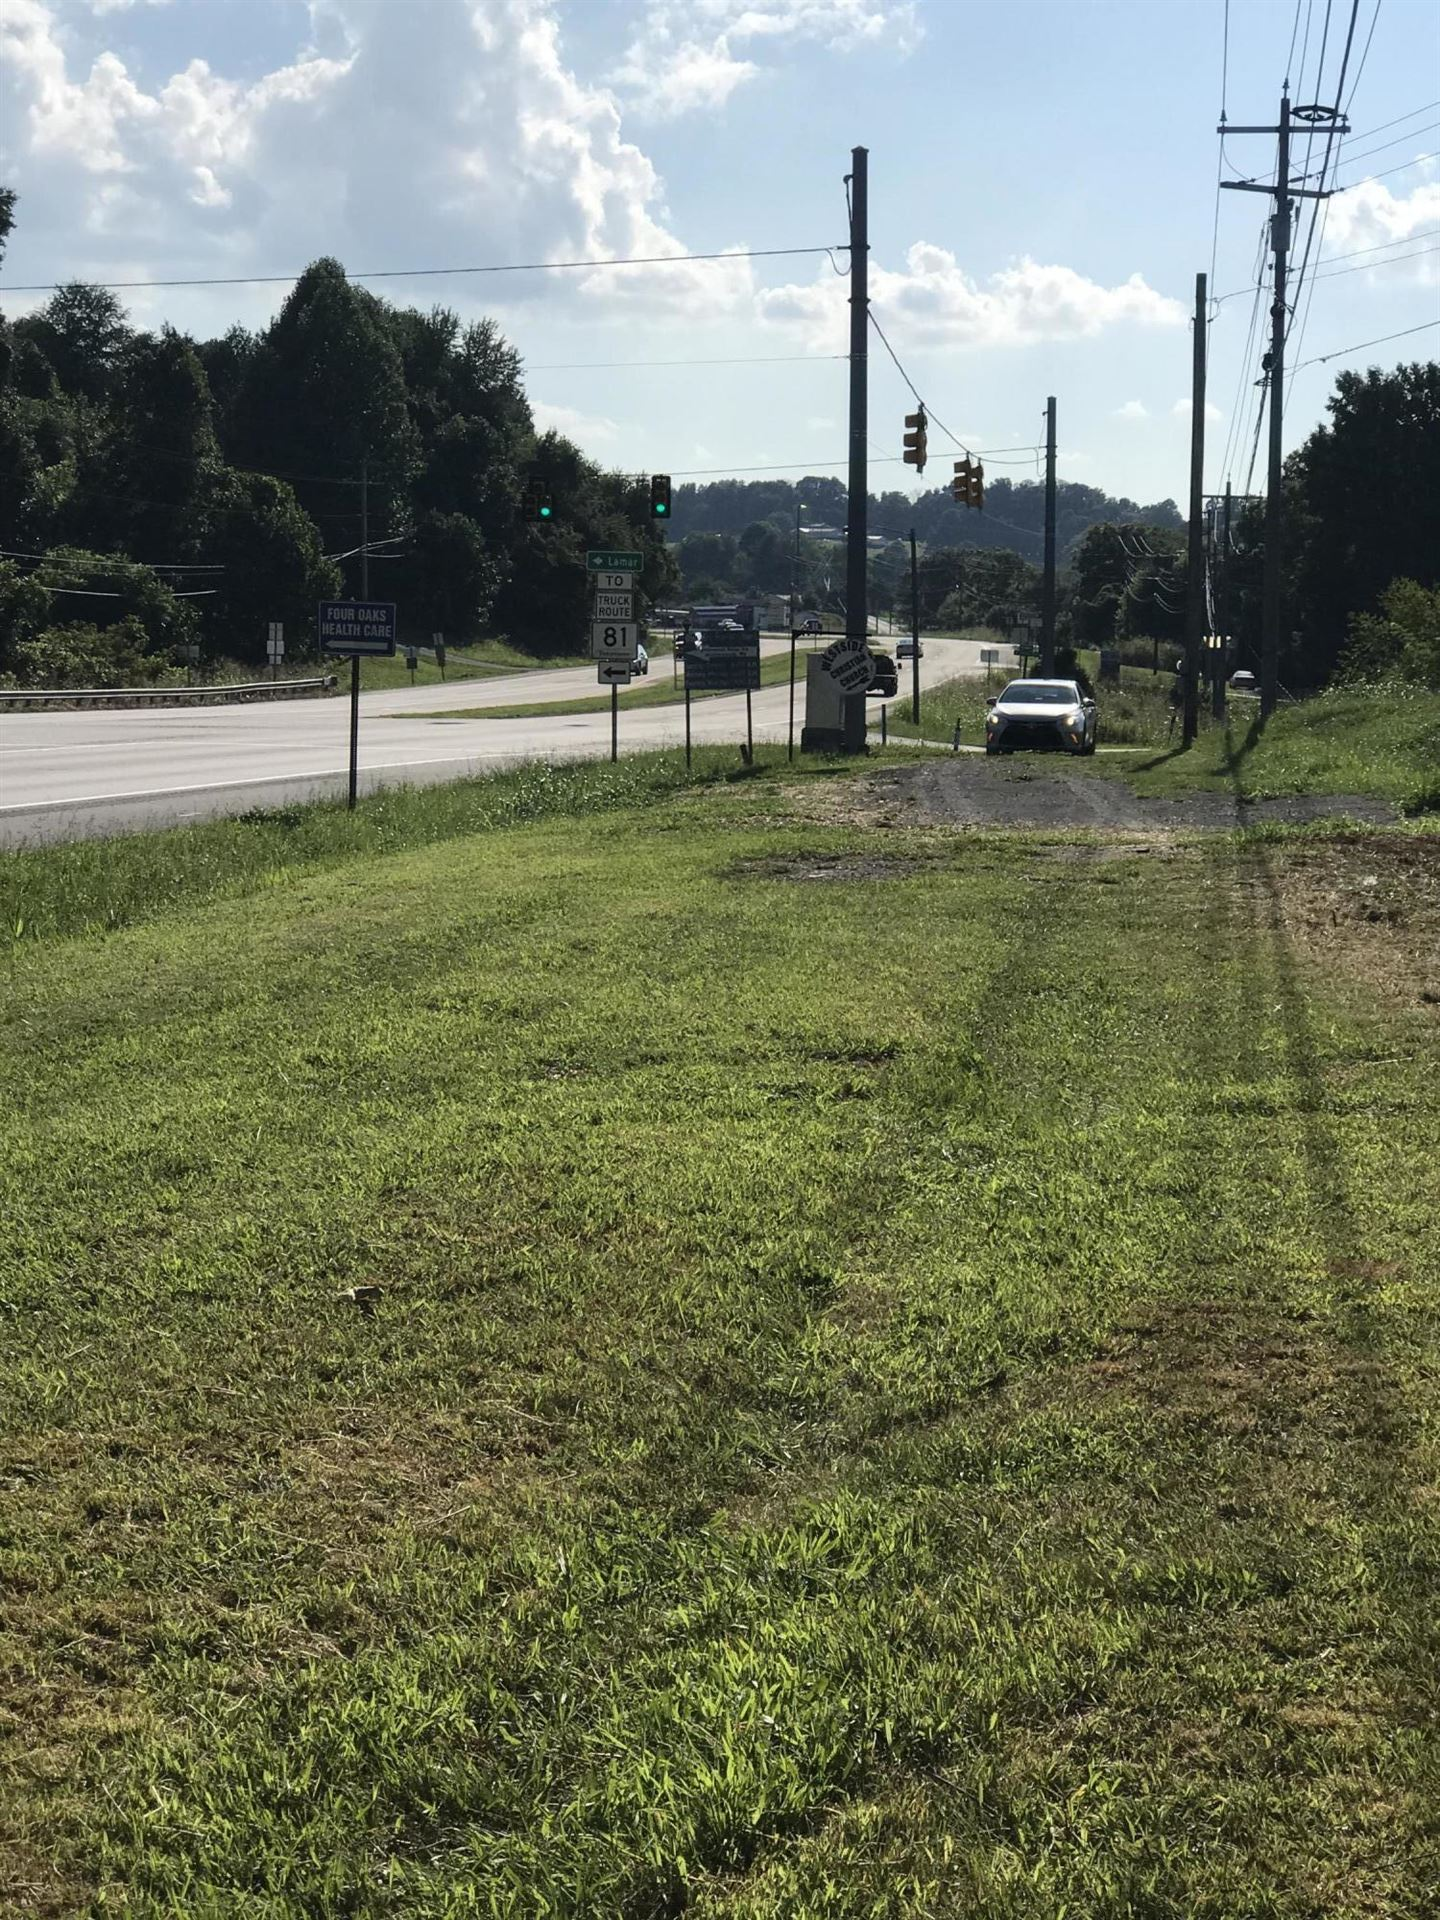 Photo of Tbd Highway 11E, Jonesborough, TN 37659 (MLS # 9927573)